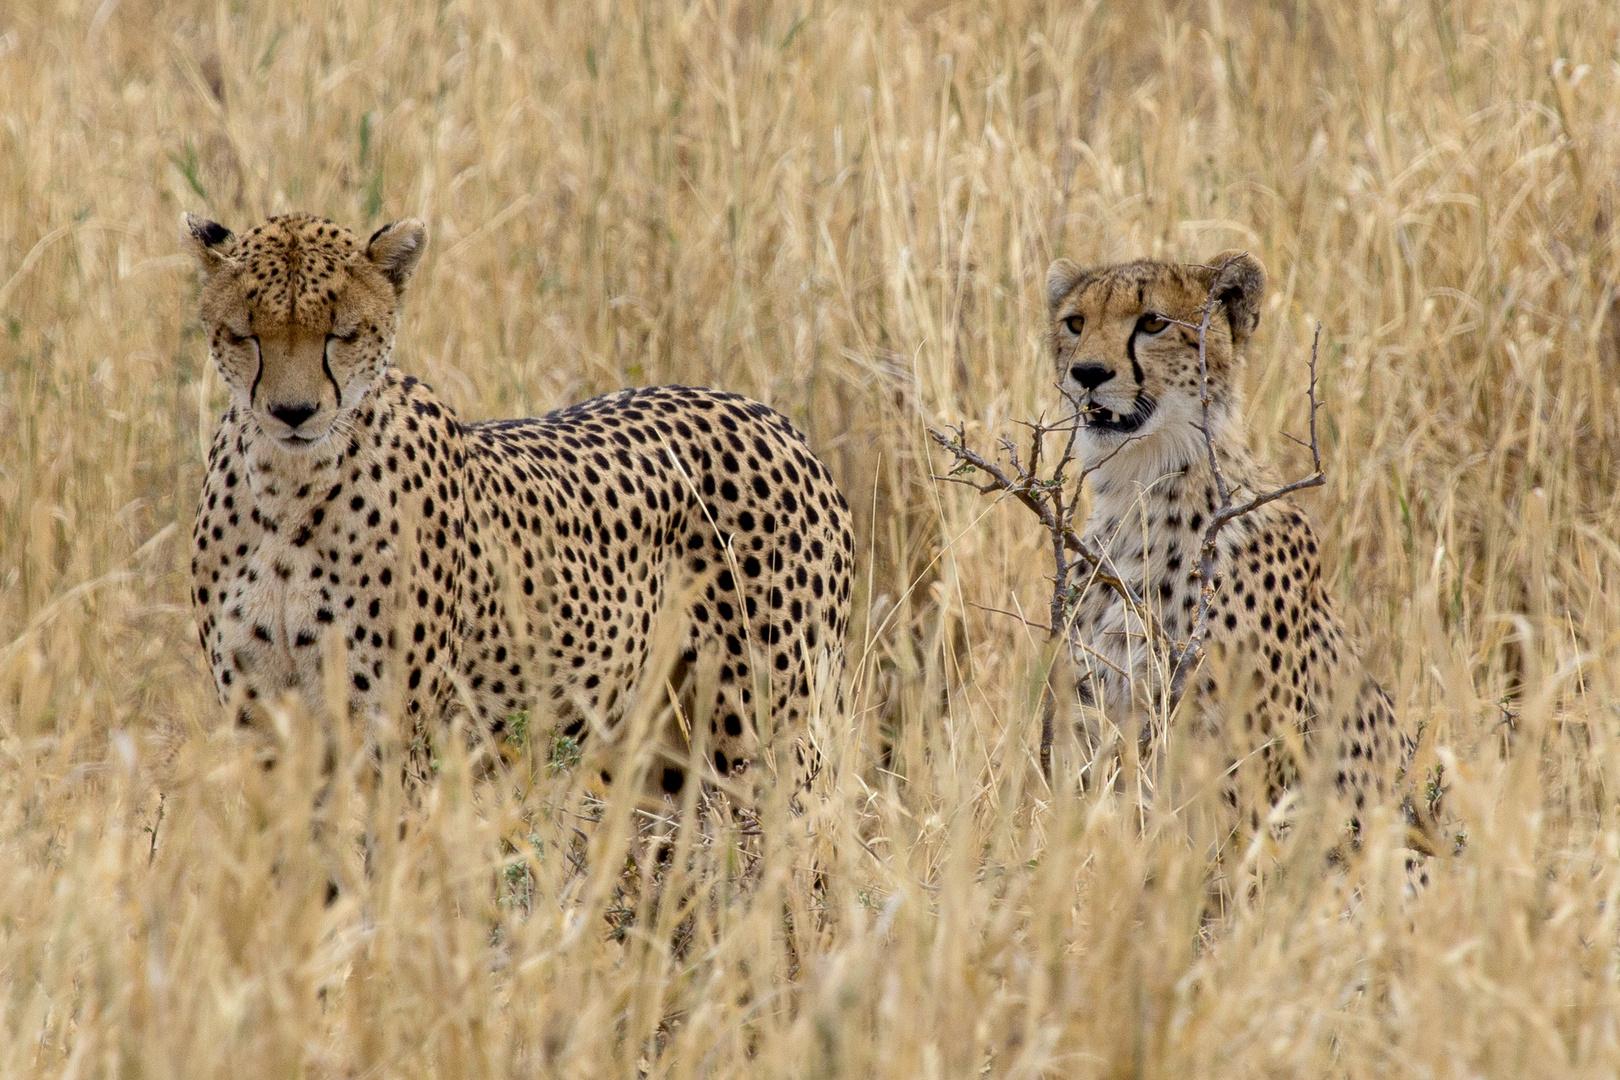 Junge Geparden trainieren die Jagd